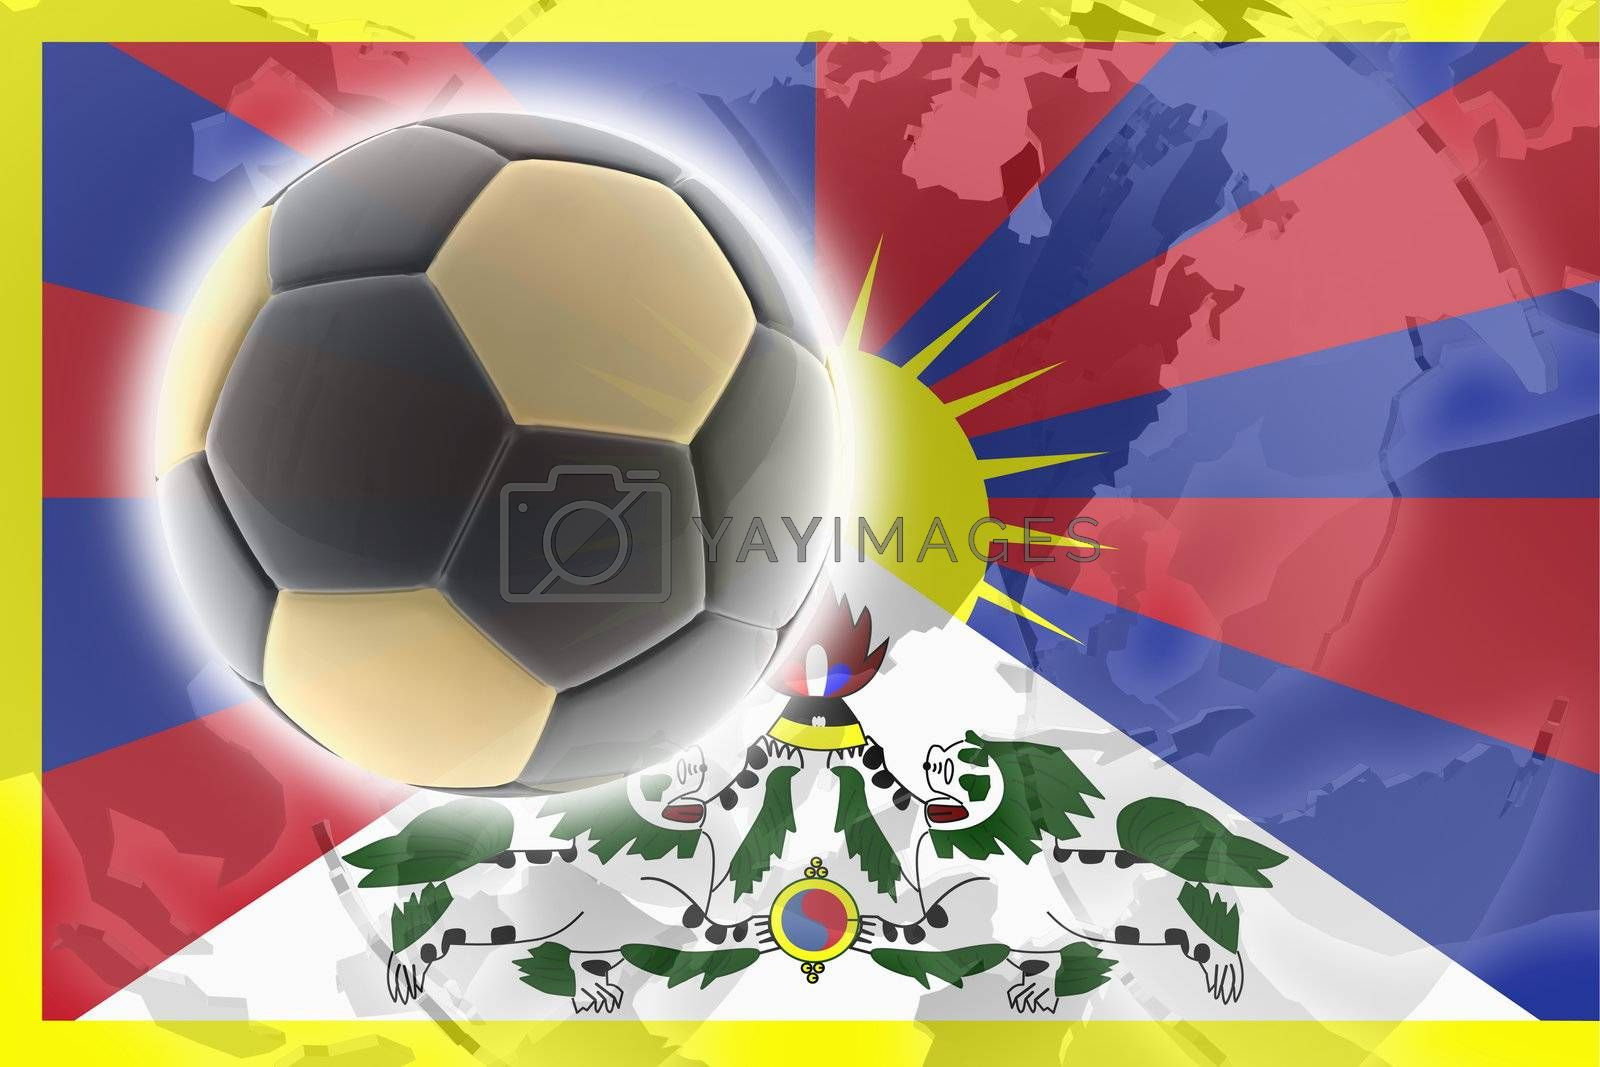 Royalty free image of Tibet flag soccer by kgtoh